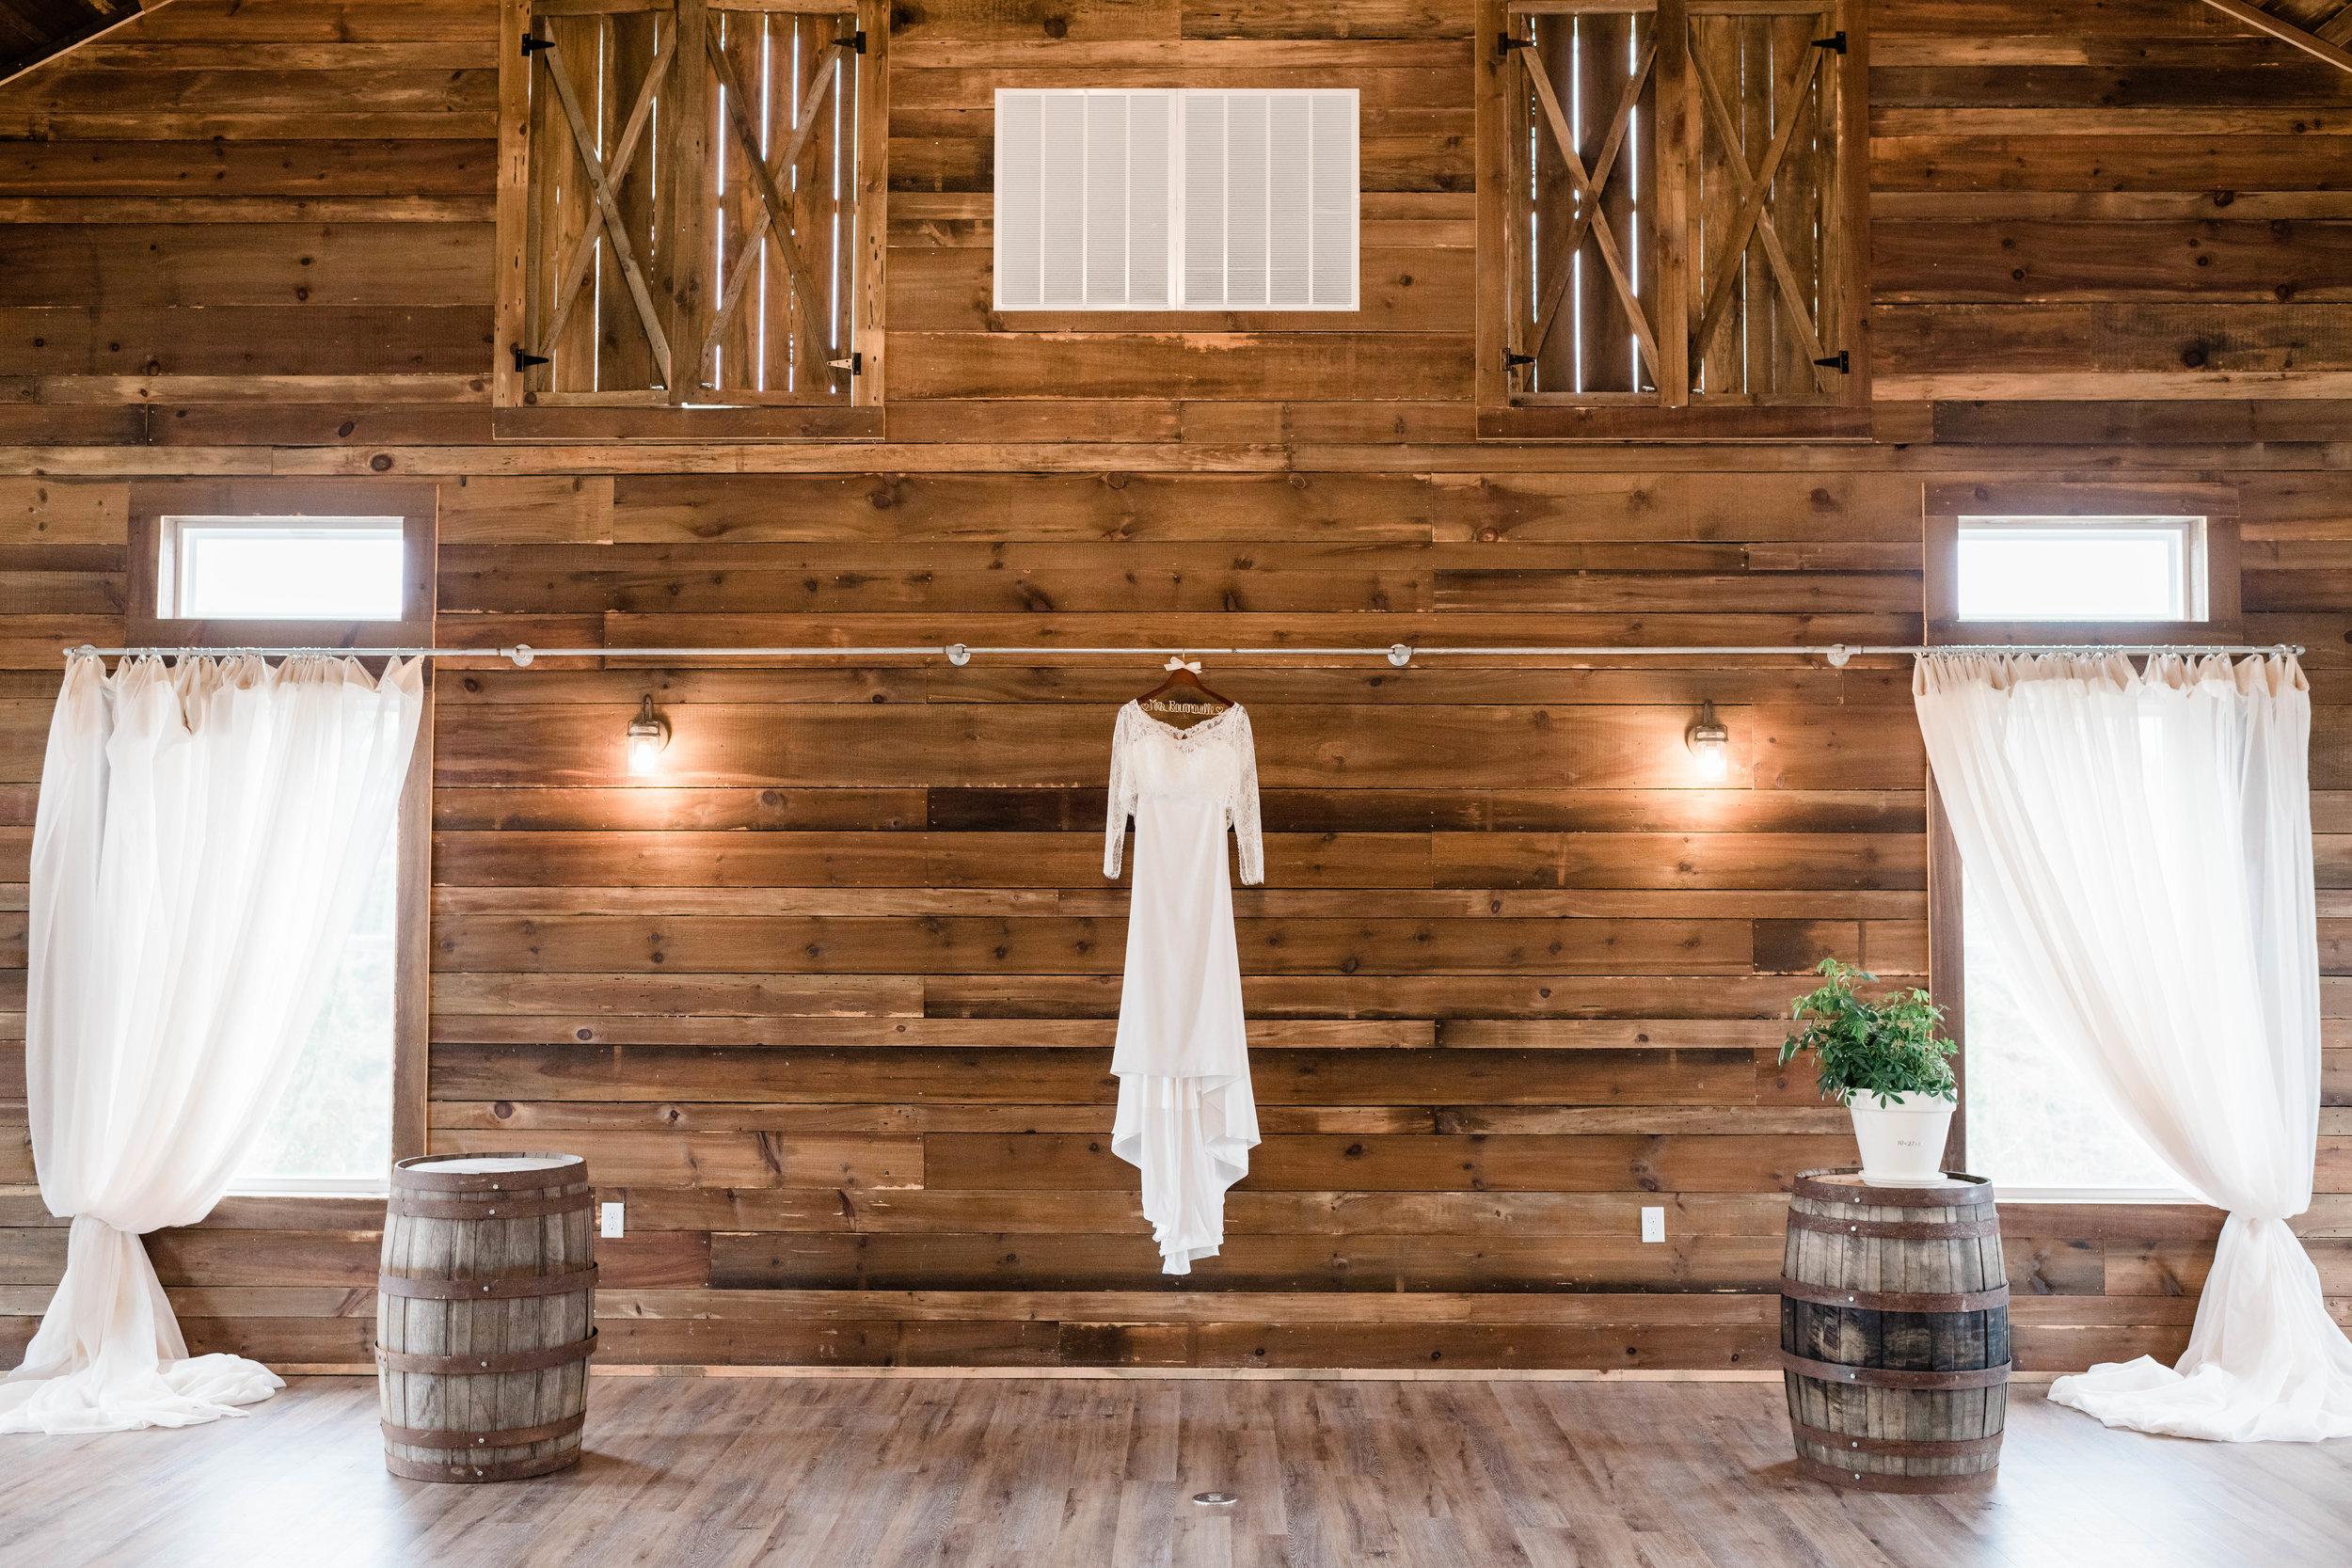 Wedding dress hanging in the wedding venue